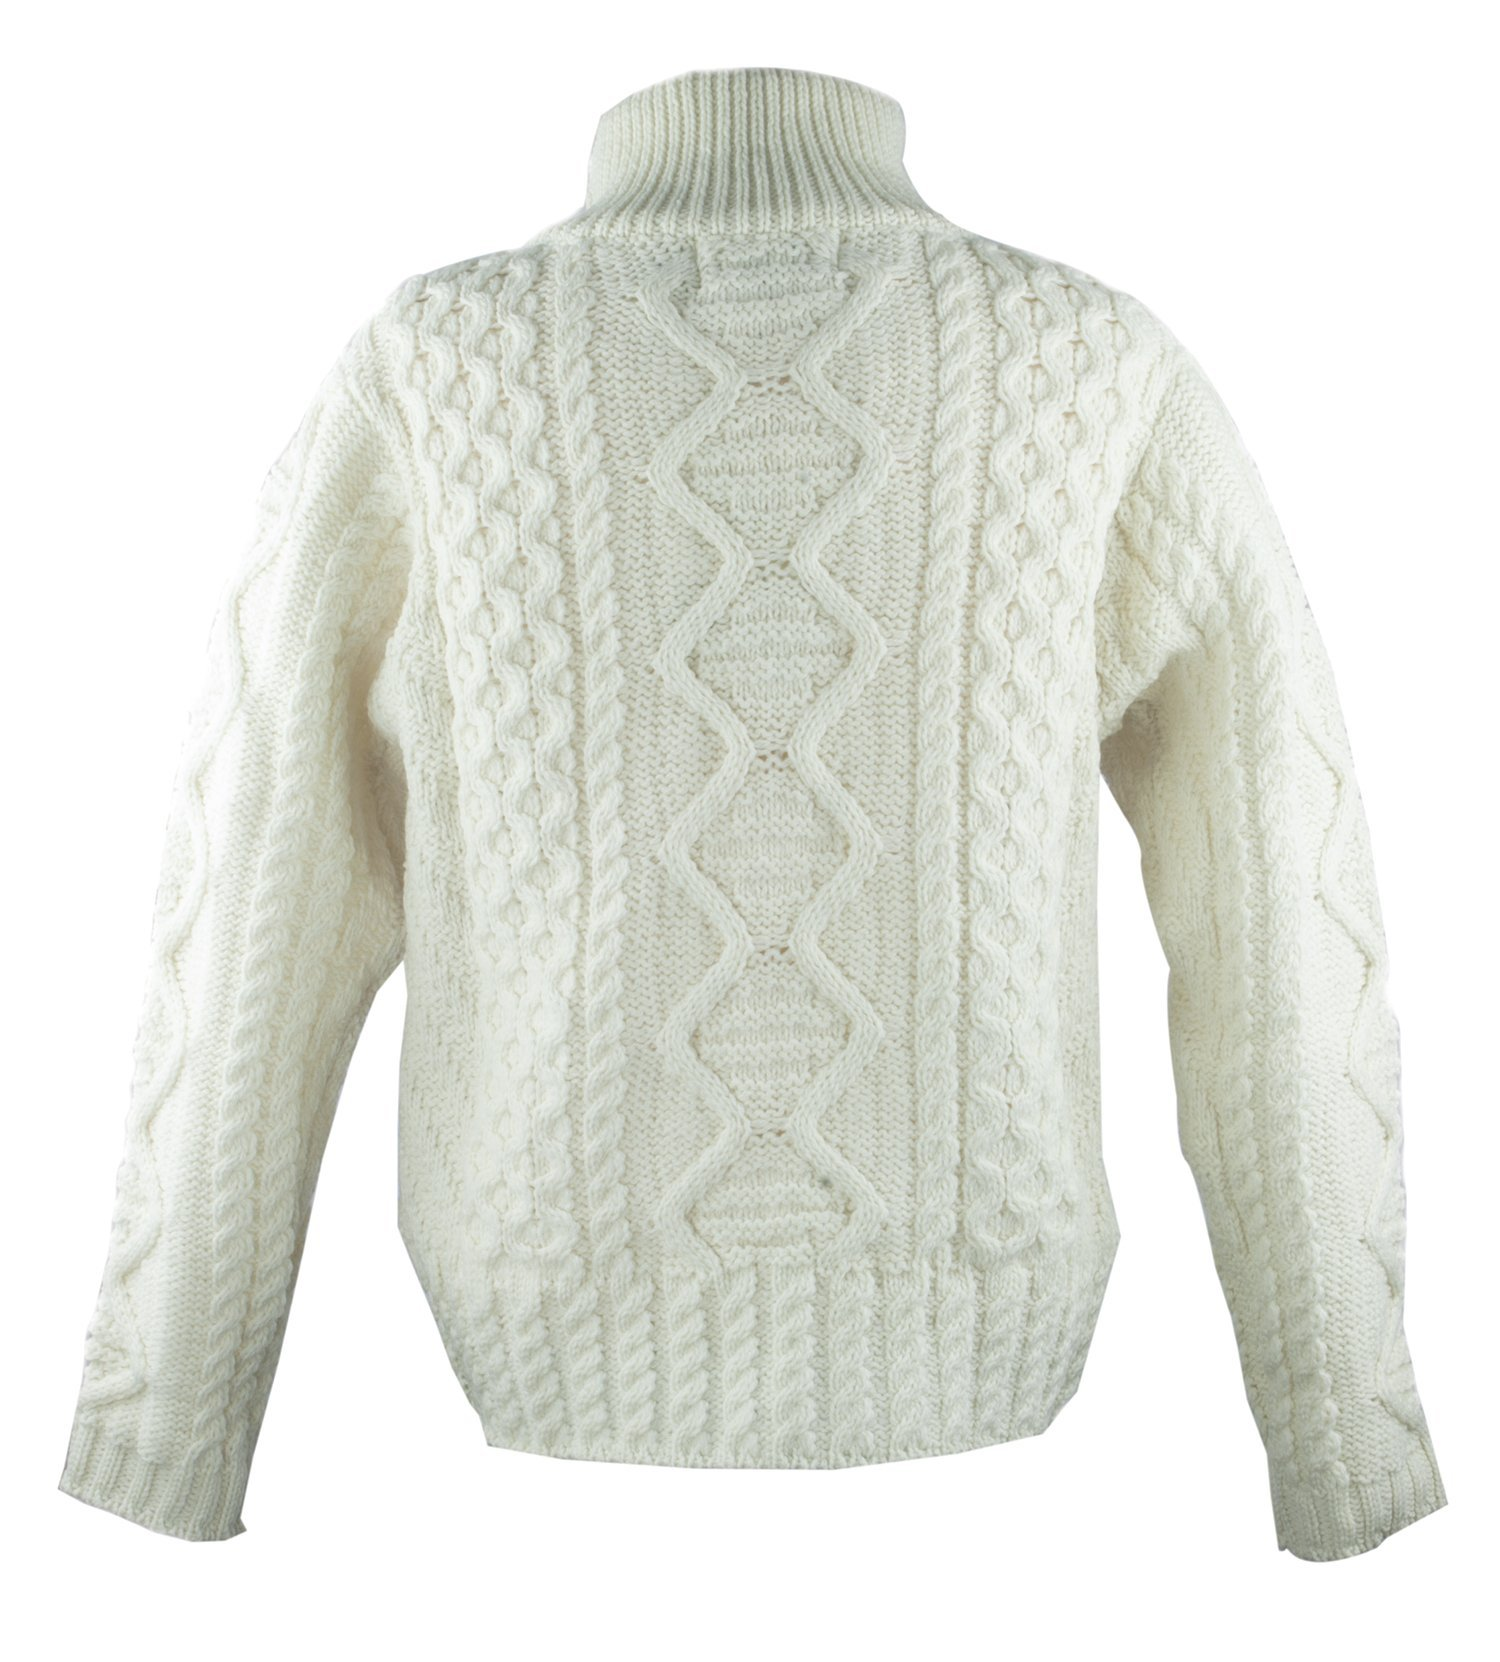 100% Irish Merino Wool Aran Knit Zip Sweater with pockets by West End Knitwear, Ecru, Small by The Irish Store - Irish Gifts from Ireland (Image #2)